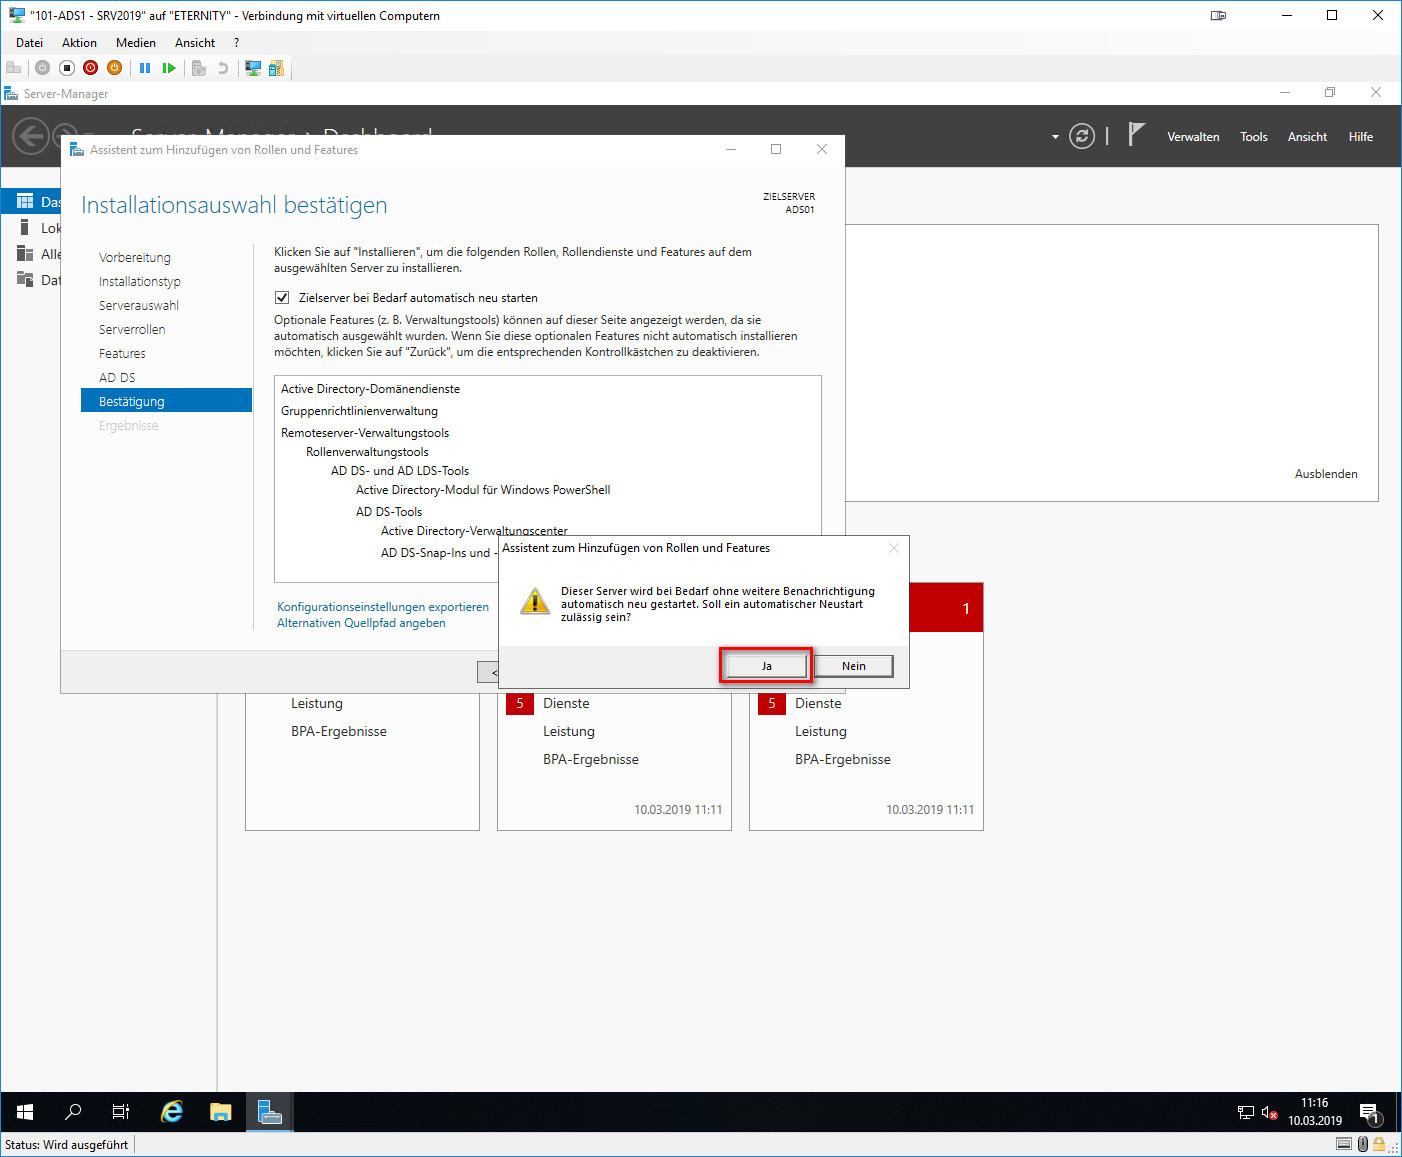 Active Directory-Domänendienste Hinweisfenster